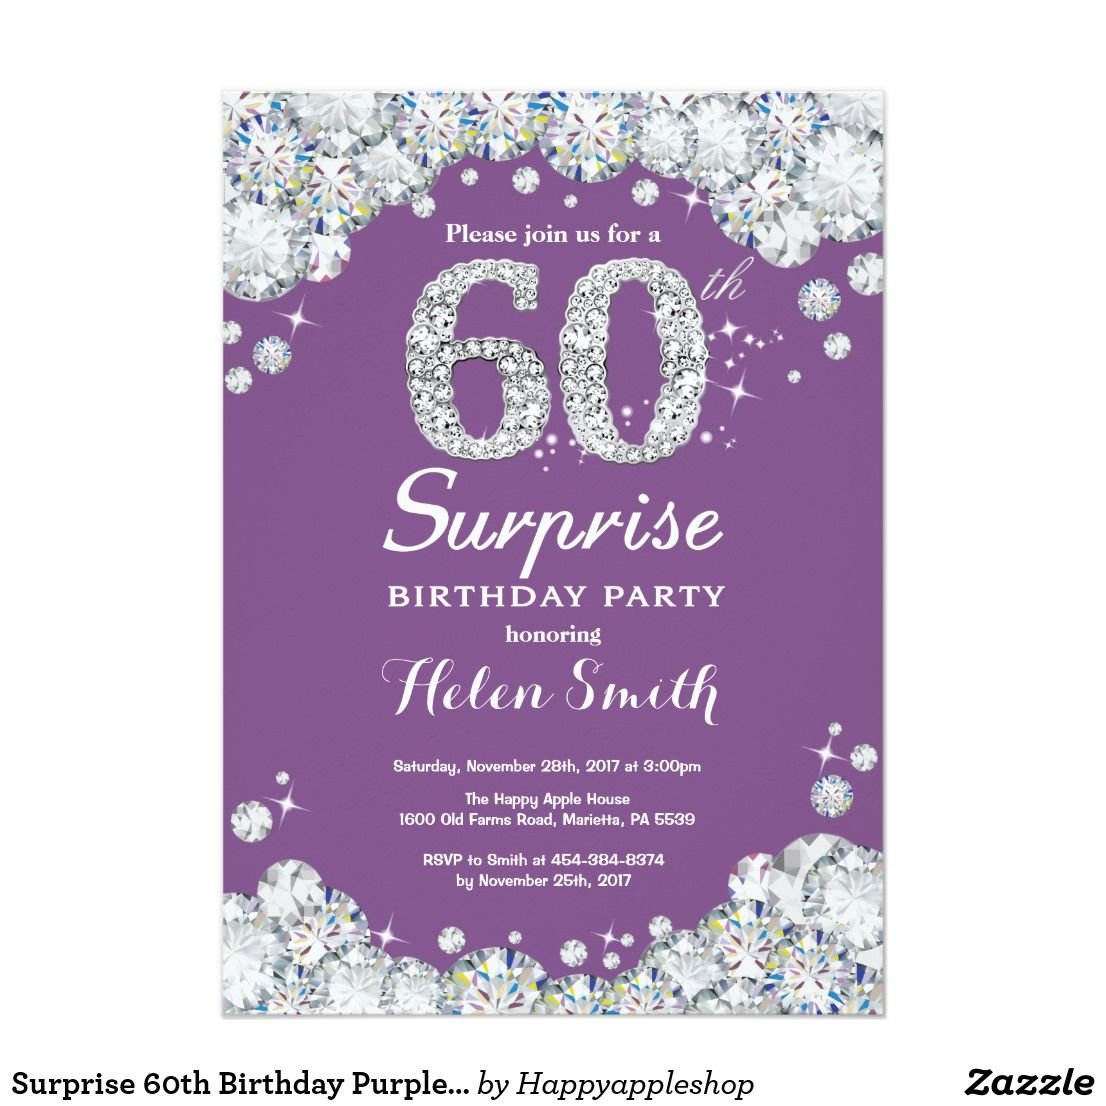 Surprise 60th Birthday Purple And Silver Diamond Invitation